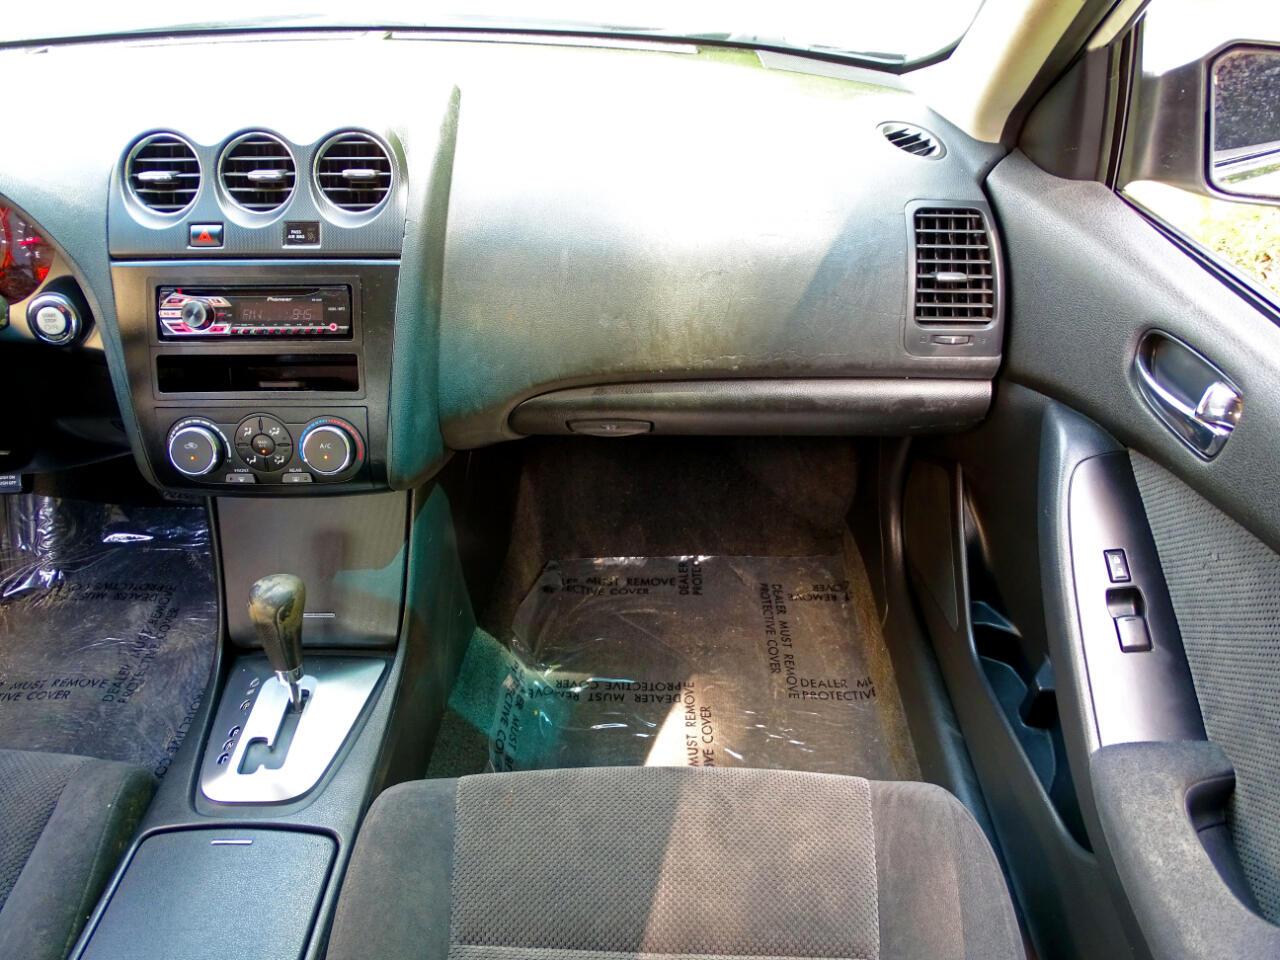 2008 Nissan Altima 4dr Sdn I4 CVT 2.5 S